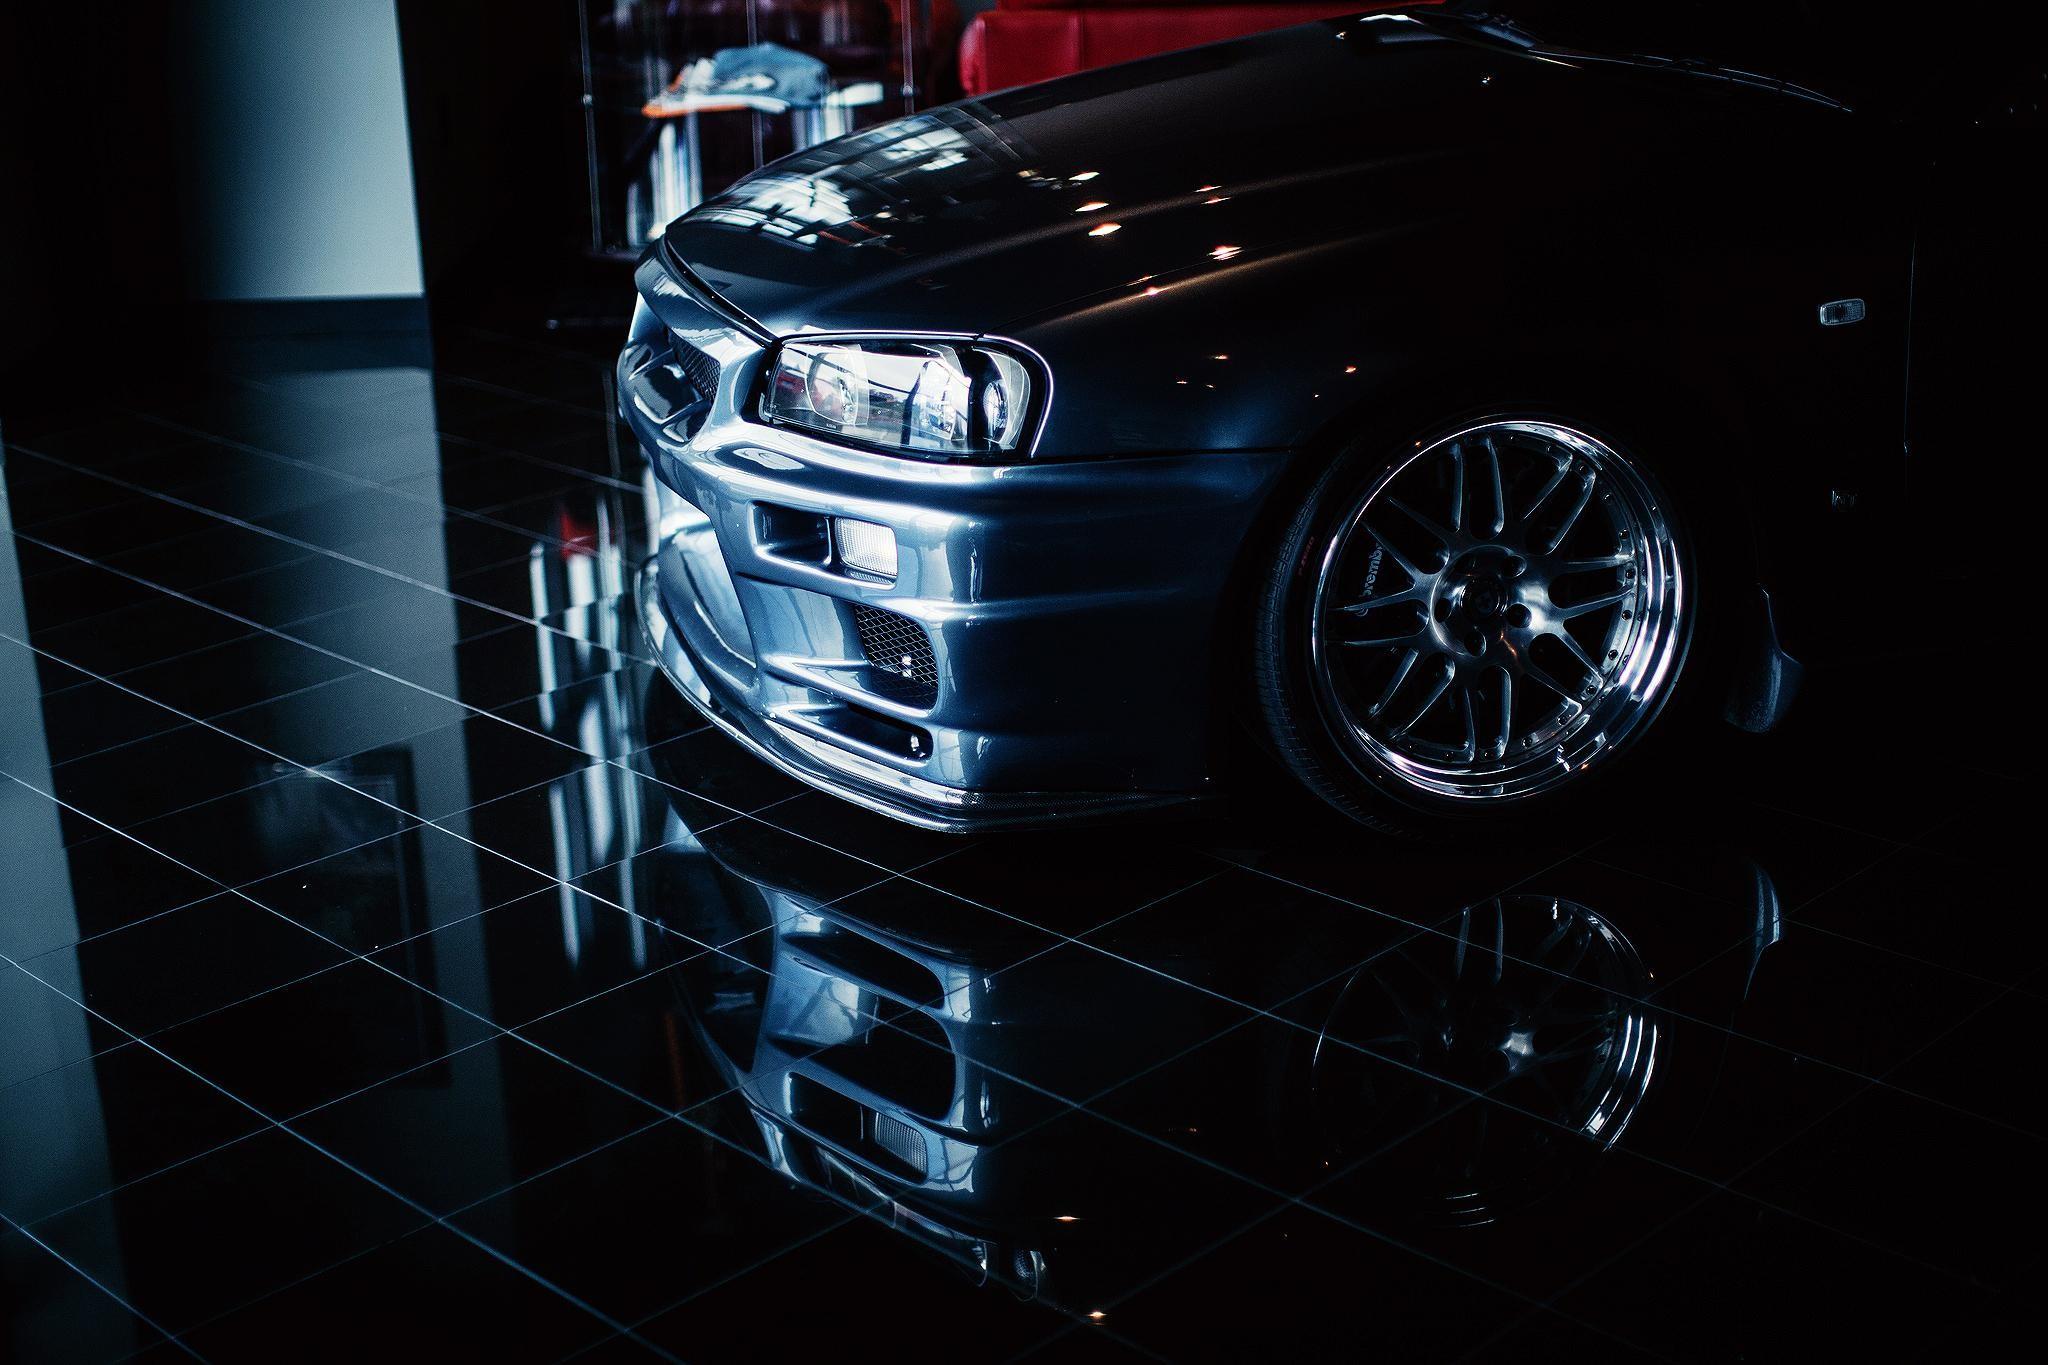 Nissan Skyline R34 wallpapers HD